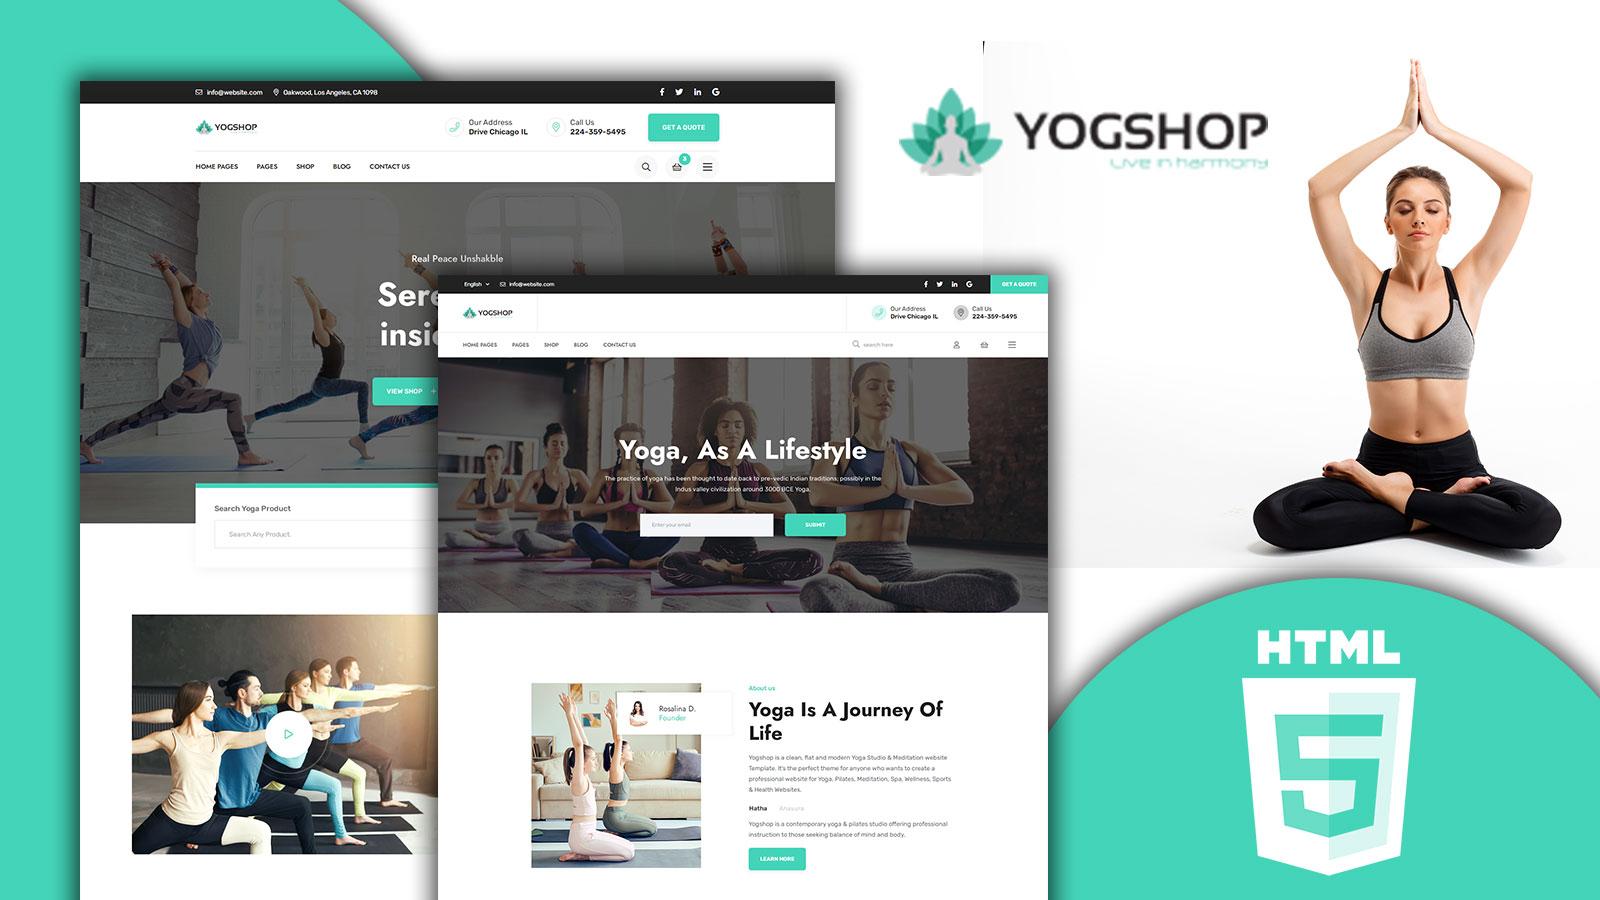 Yogshop Clean Yoga Studio HTML5 Website template